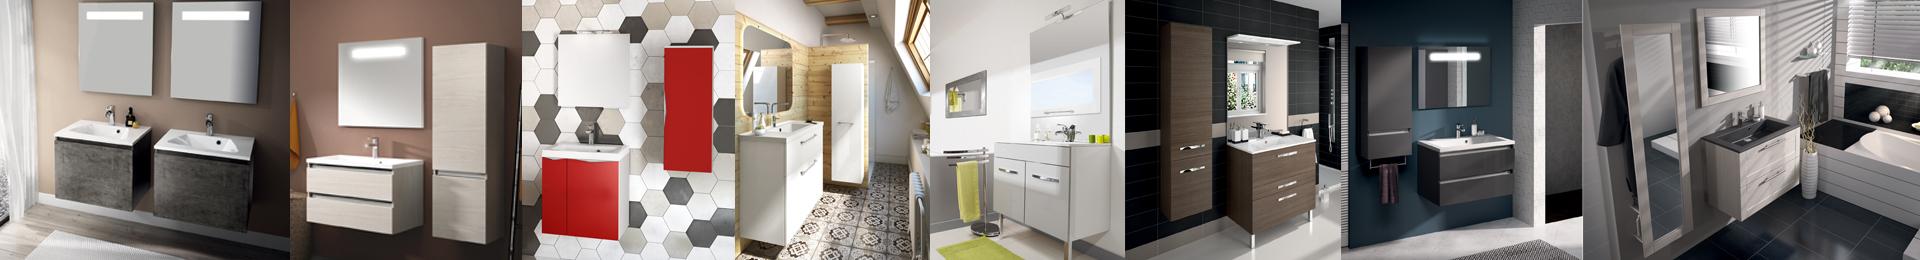 Petit meuble salle de bain meuble petite sdb - Meuble salle de bain petite largeur ...